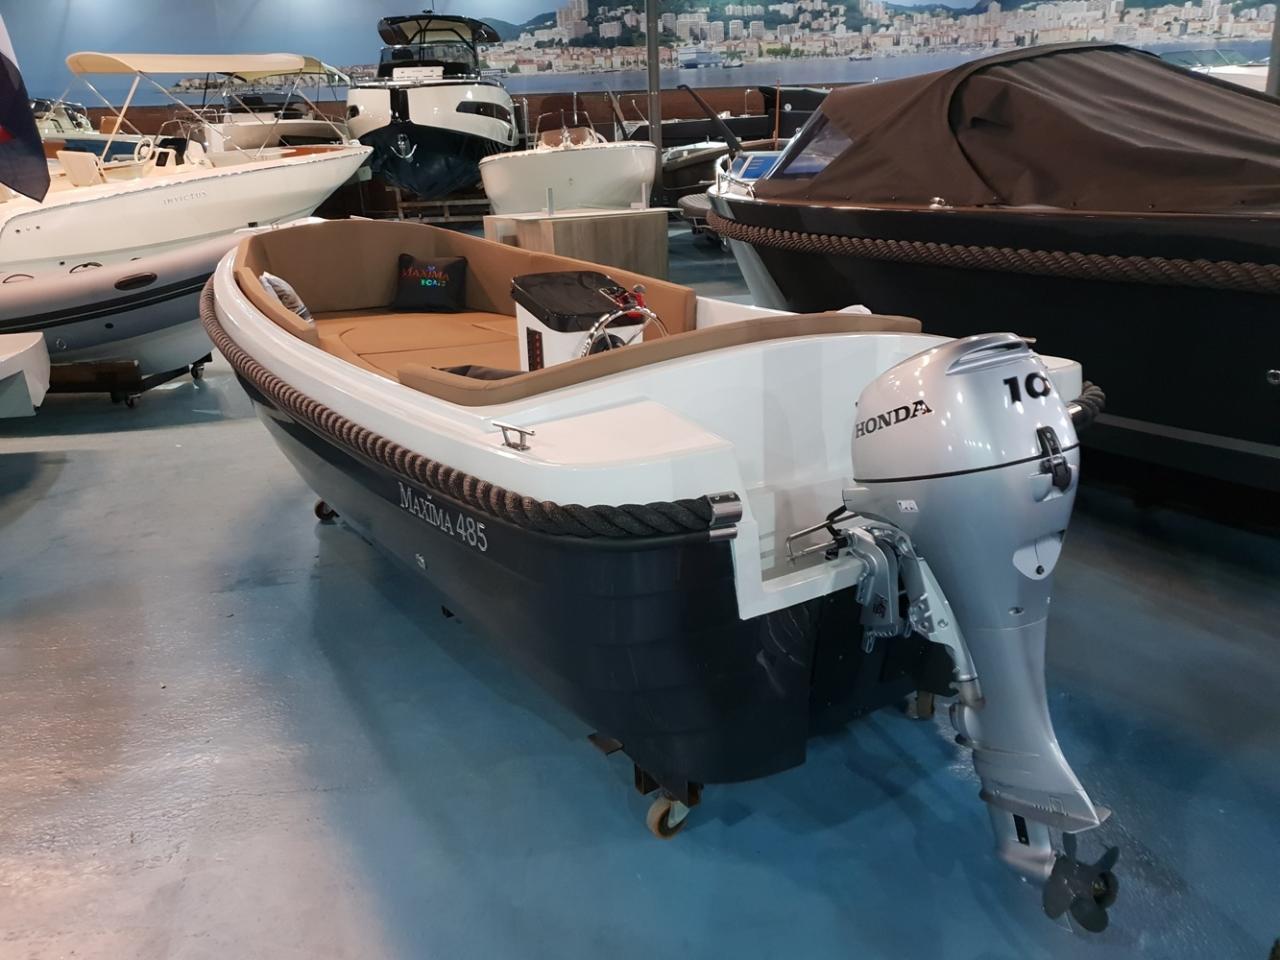 Maxima 485 met 10 pk Honda outboard motor 4